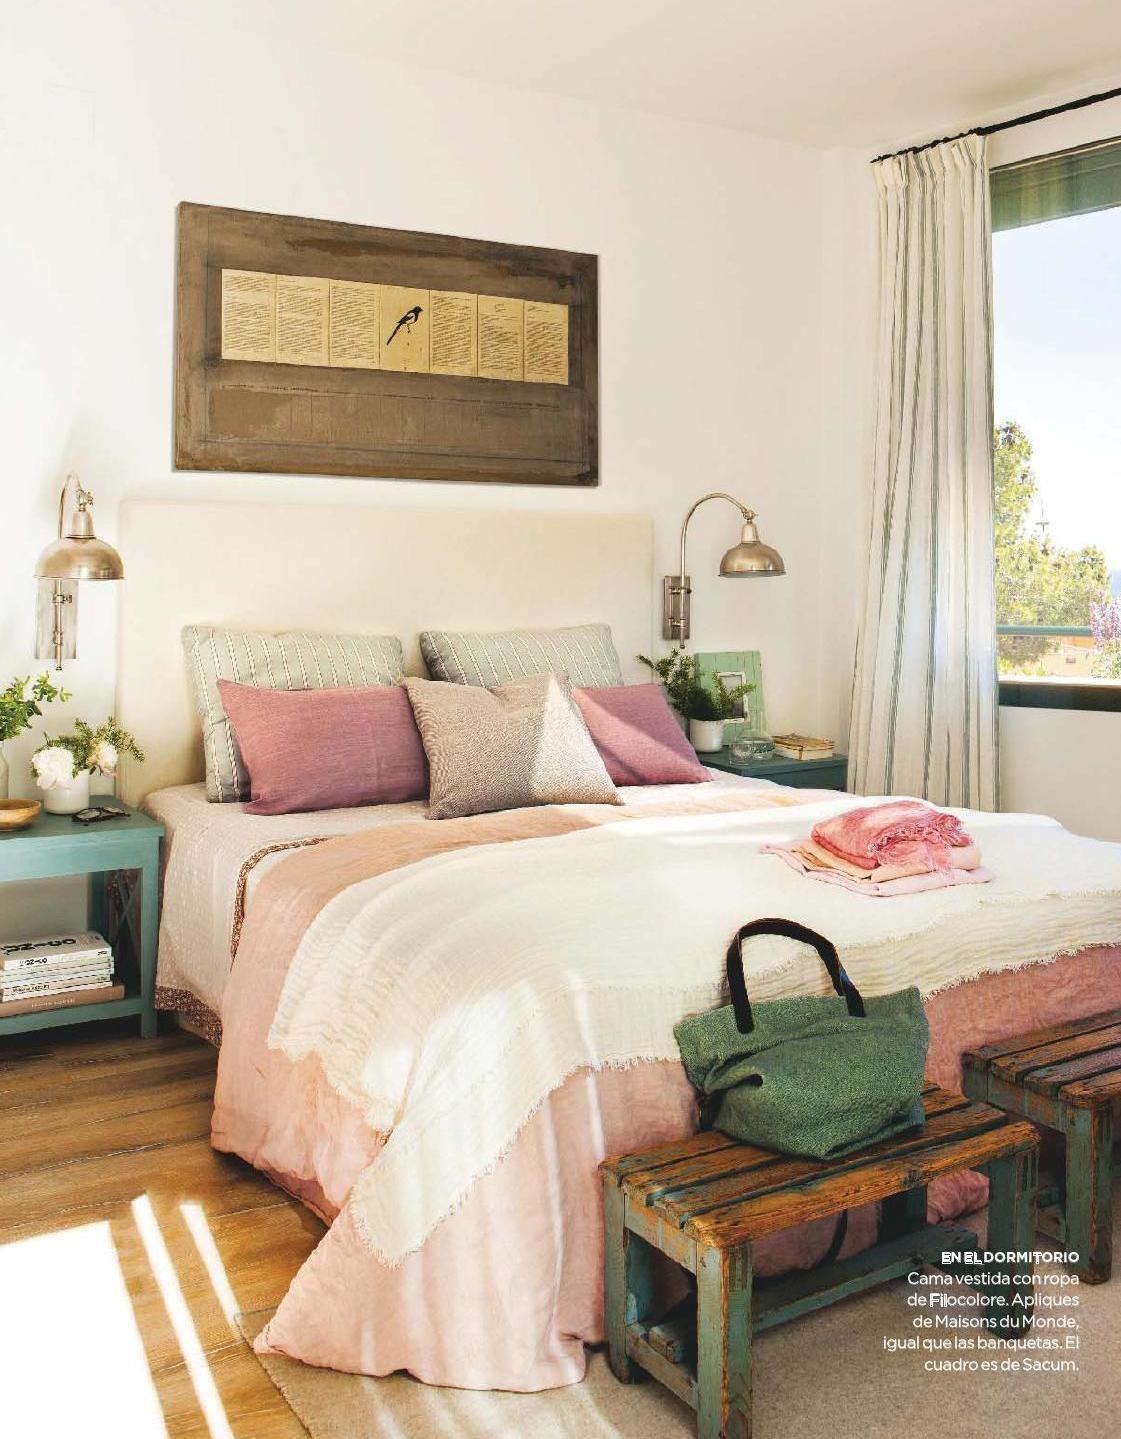 Pin de Cristina Martínez en Decorar | Pinterest | Dormitorio, Verde ...